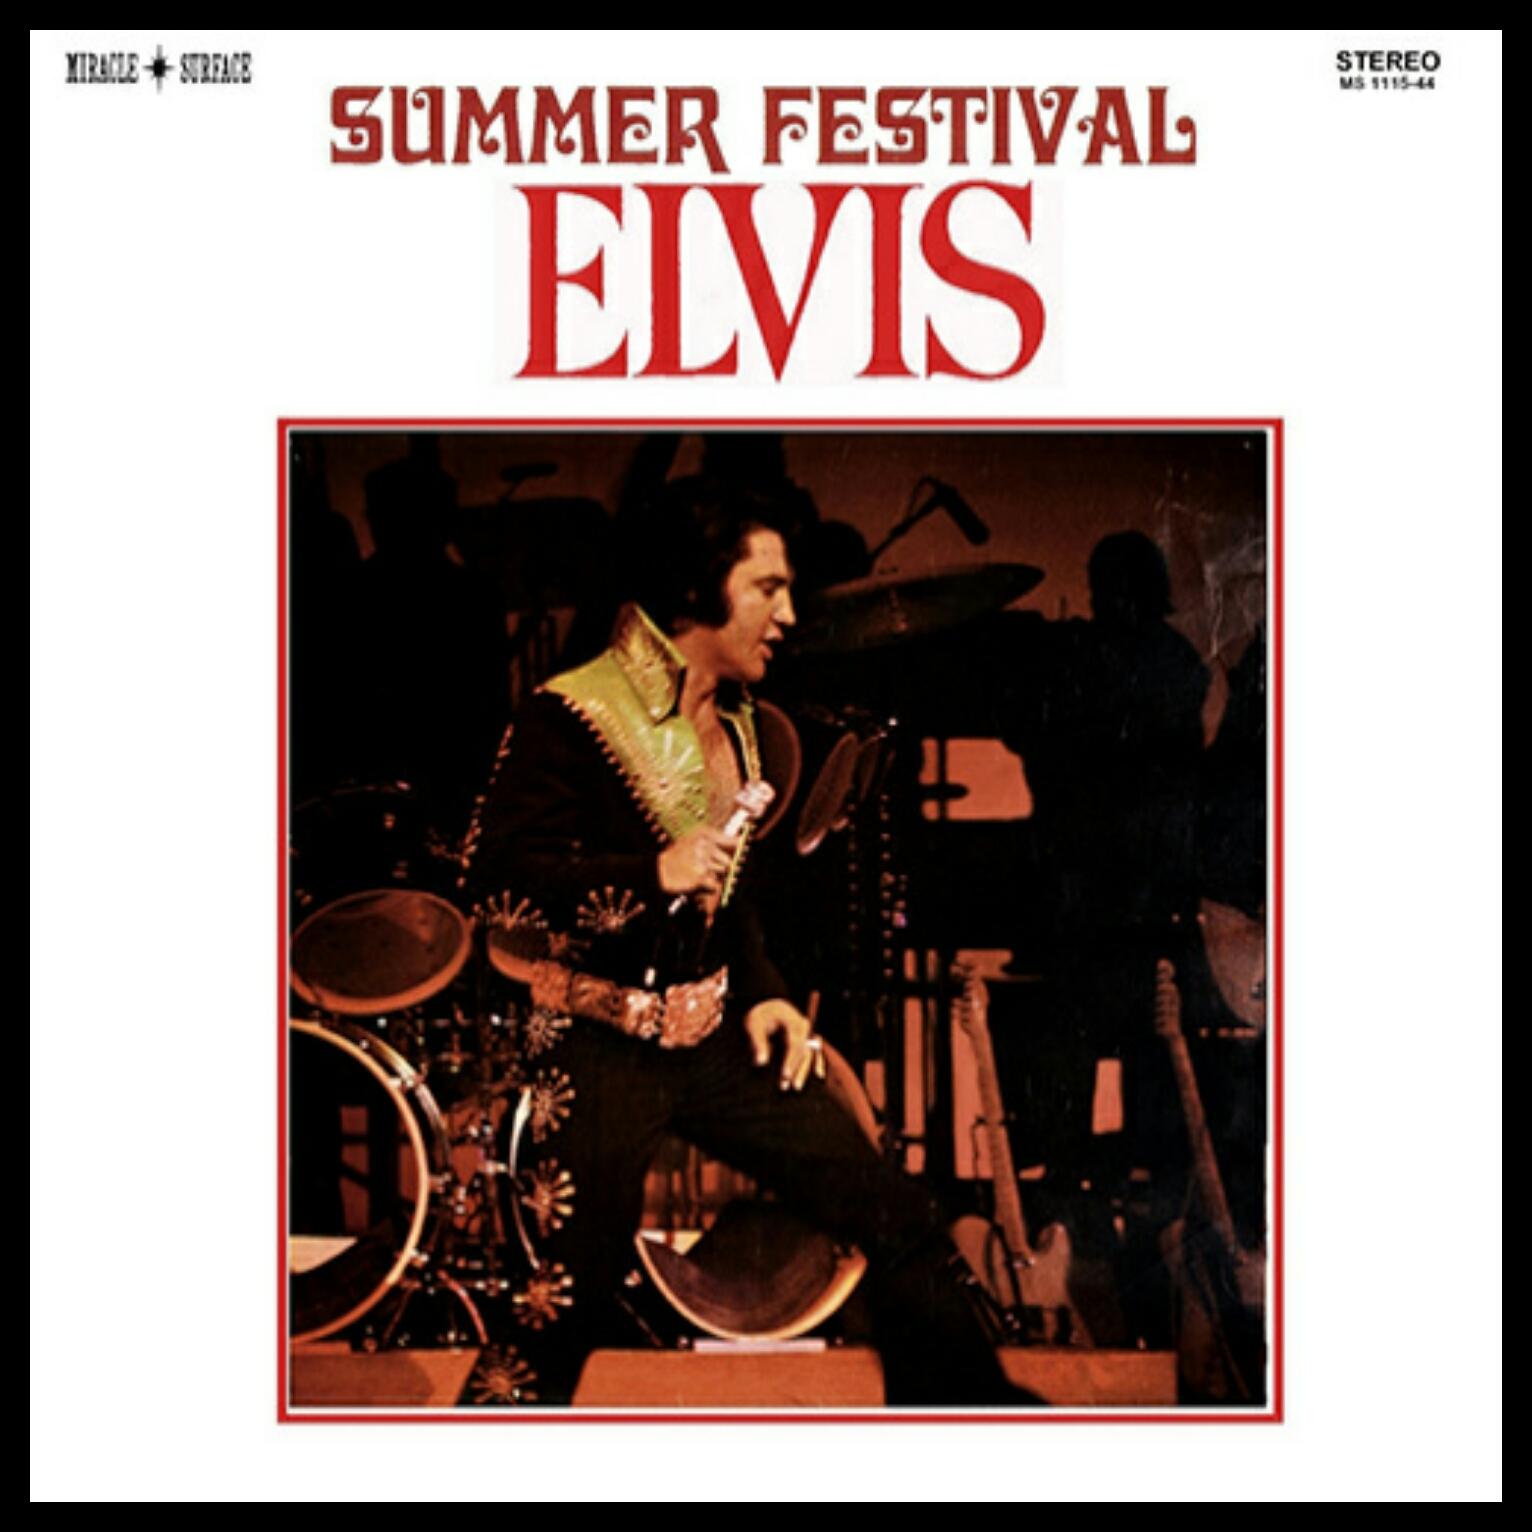 Summer Festival Elvis Img_2020-09-26_22-12-m1jb3